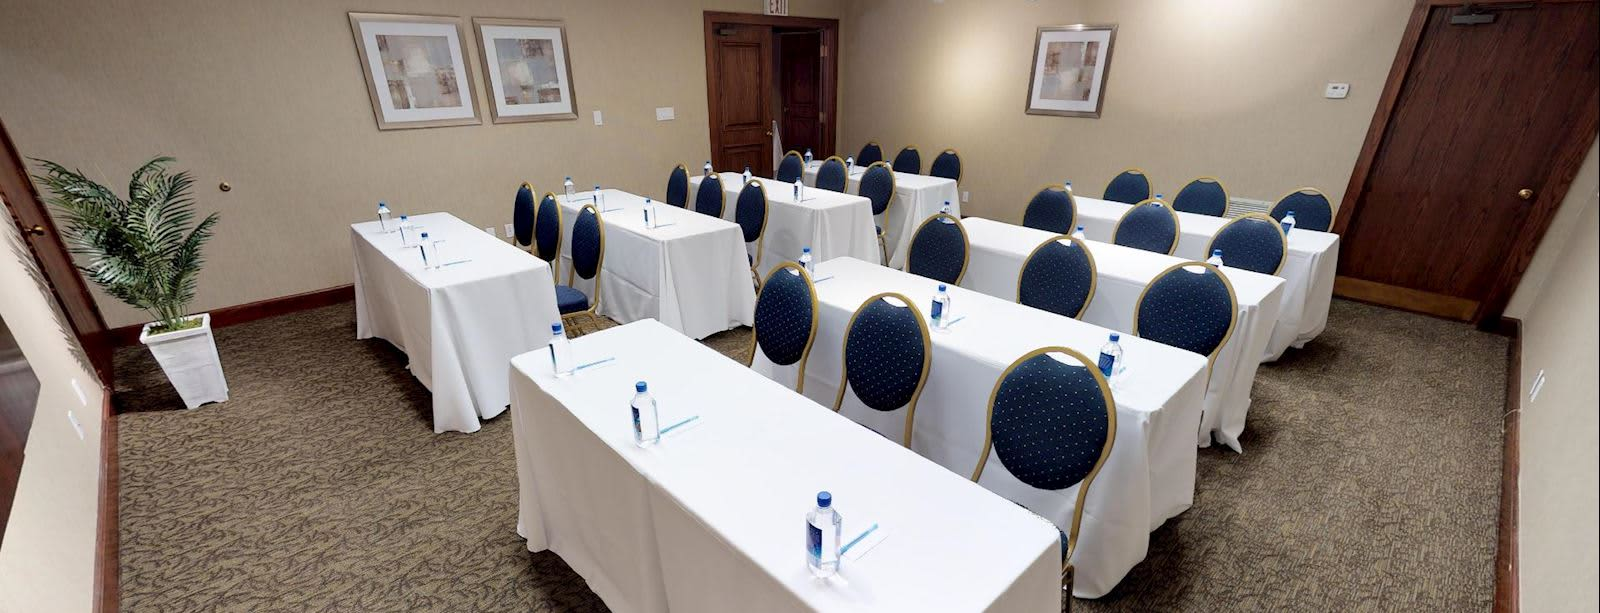 Meetings & Events in Brea California Hotel